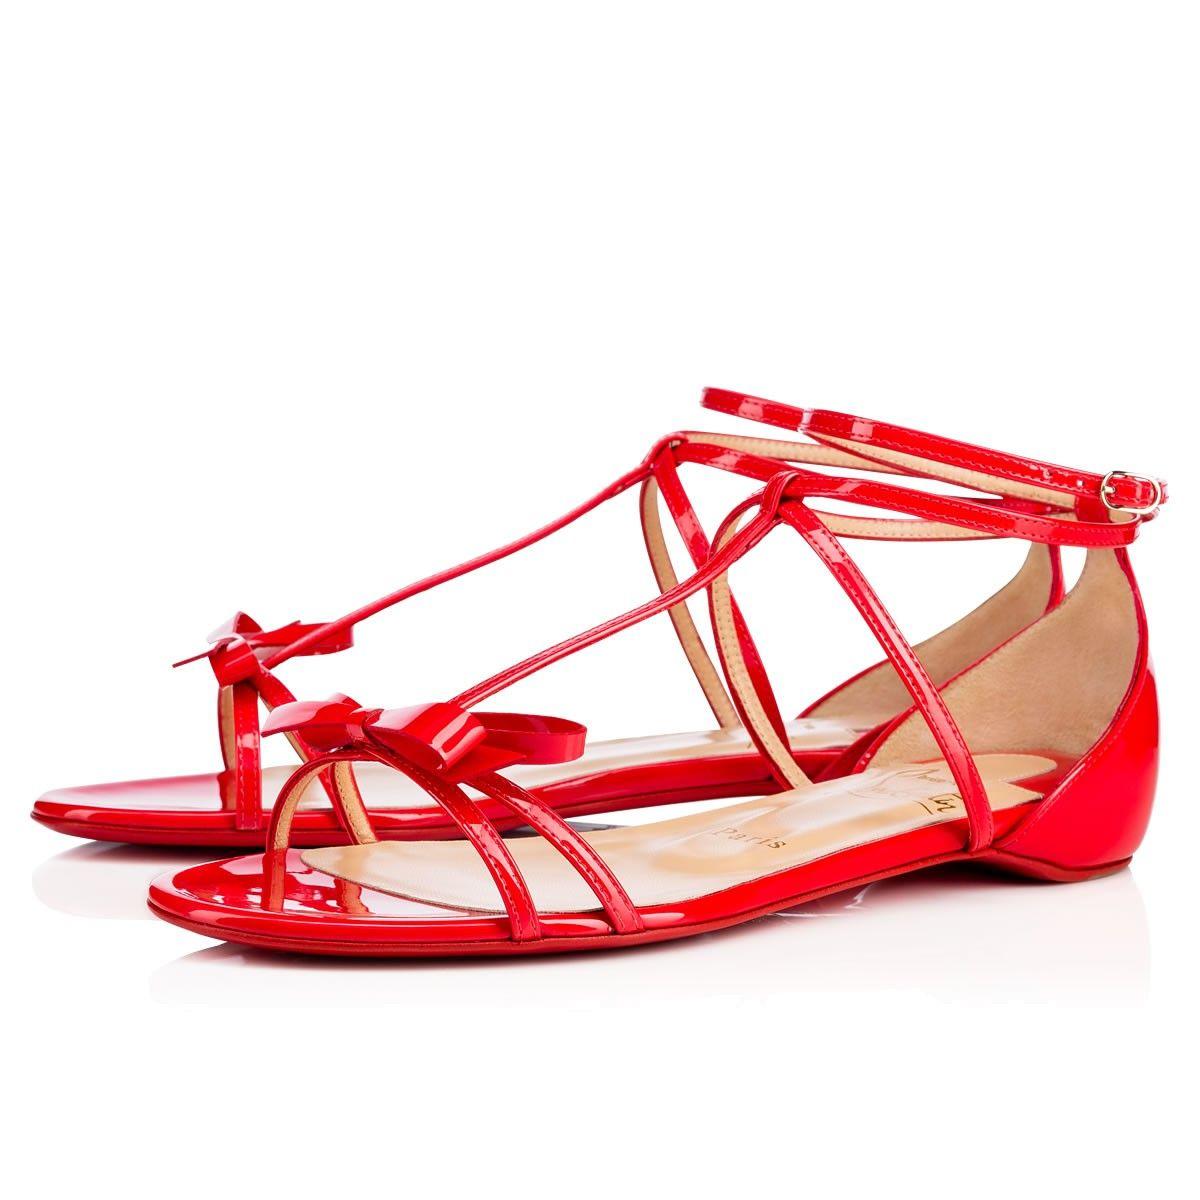 f6874a61aa2c CHRISTIAN LOUBOUTIN Blakissima Flat Fraise Patent - Women Shoes - Christian  Louboutin.  christianlouboutin  shoes